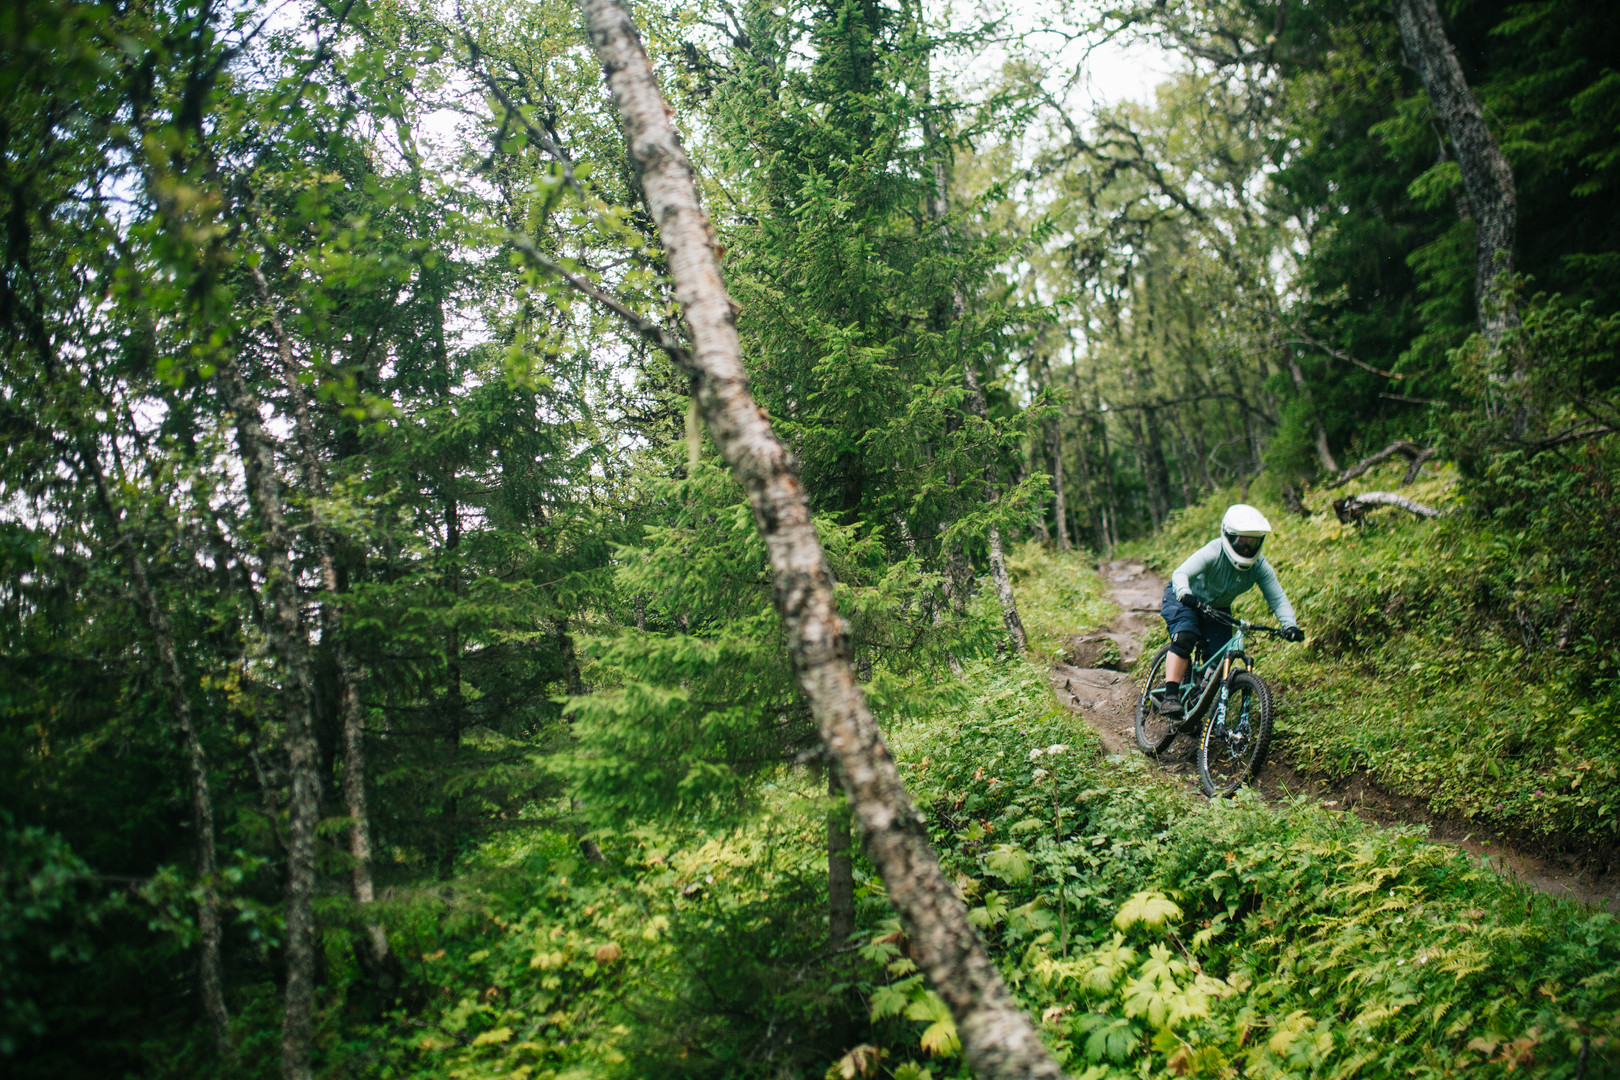 Hanna Jonsson at Are Bike Park